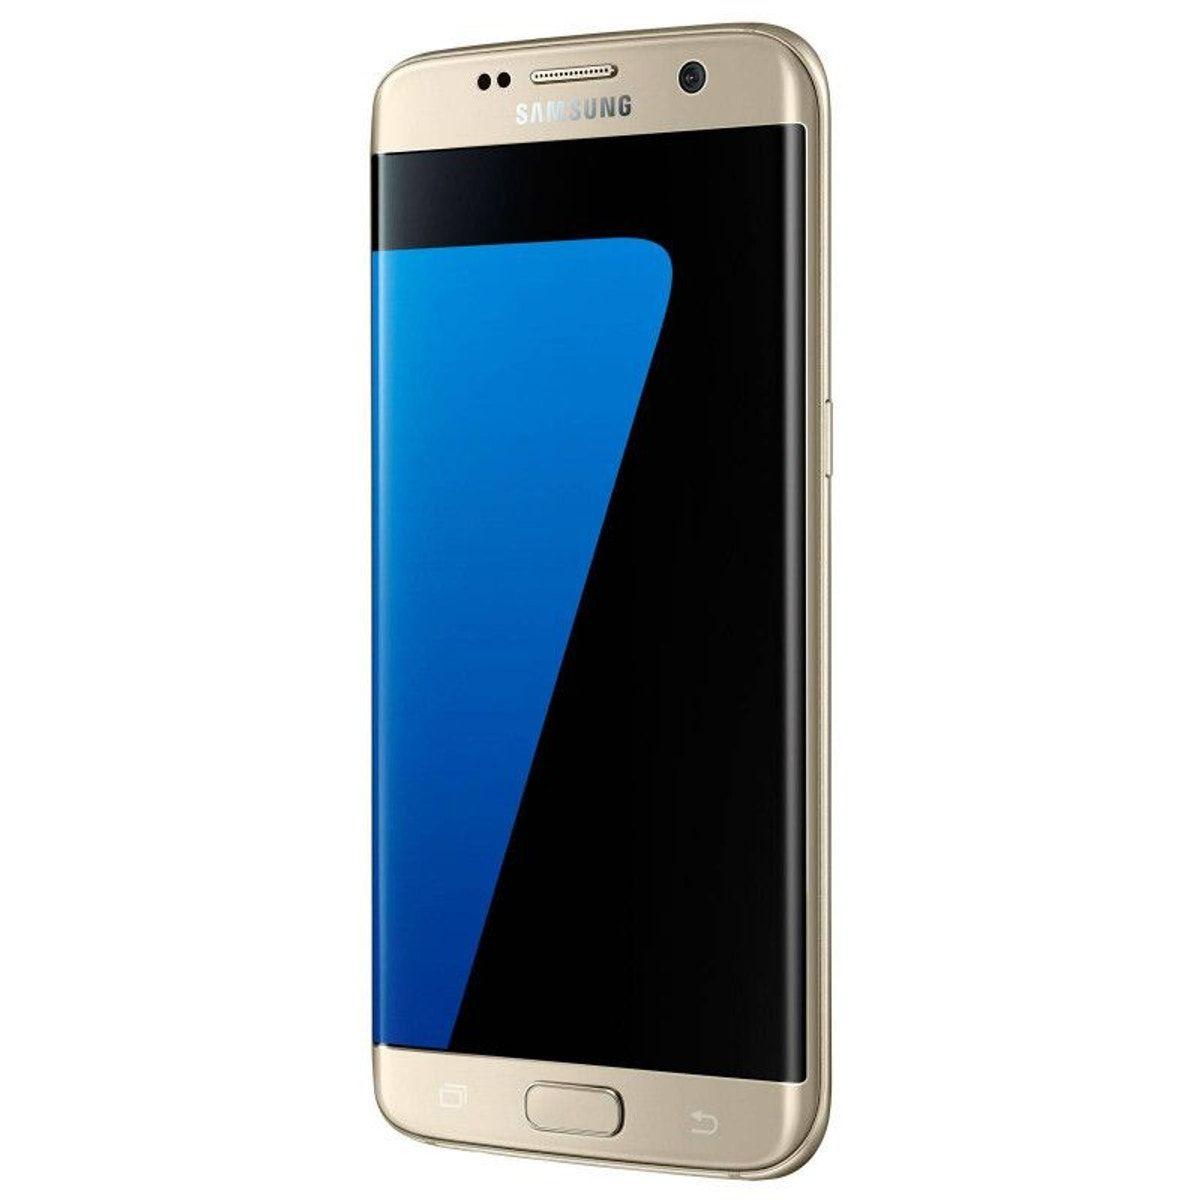 Smartphone Modele Galaxy S7 Edge 32 Go Products Smartphone